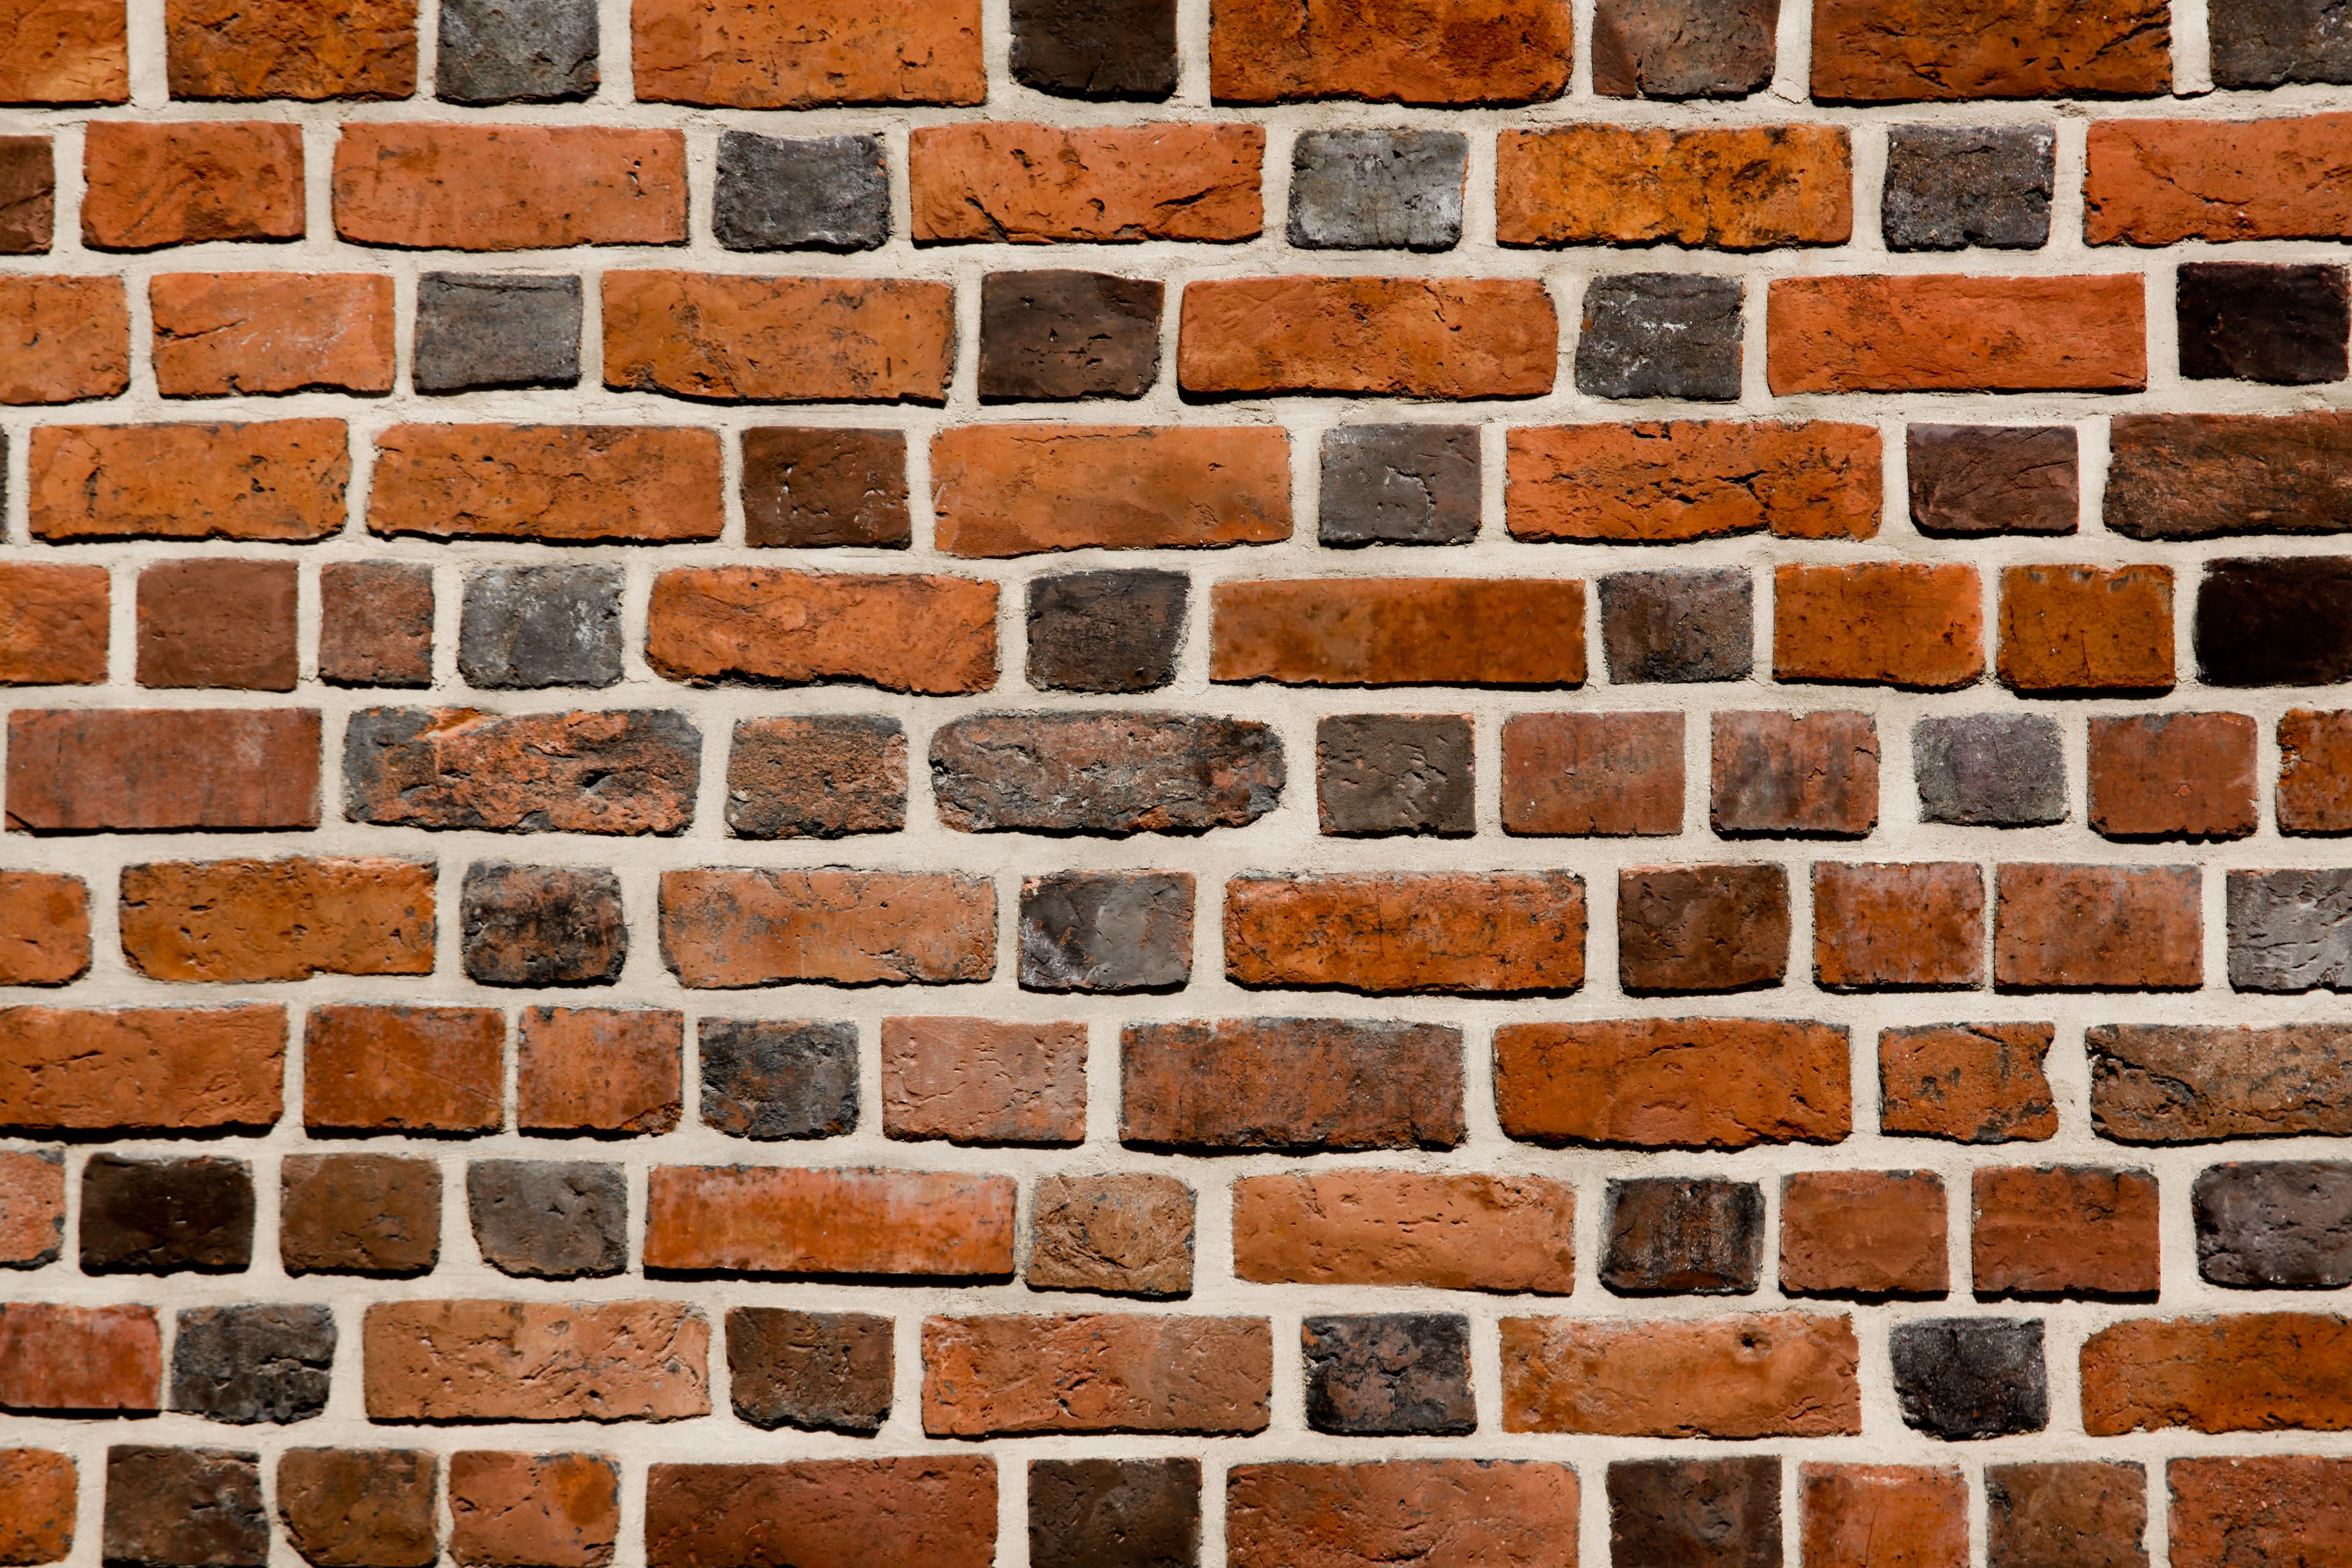 File:Brick wall close-up view.jpg - Wikimedia Commons